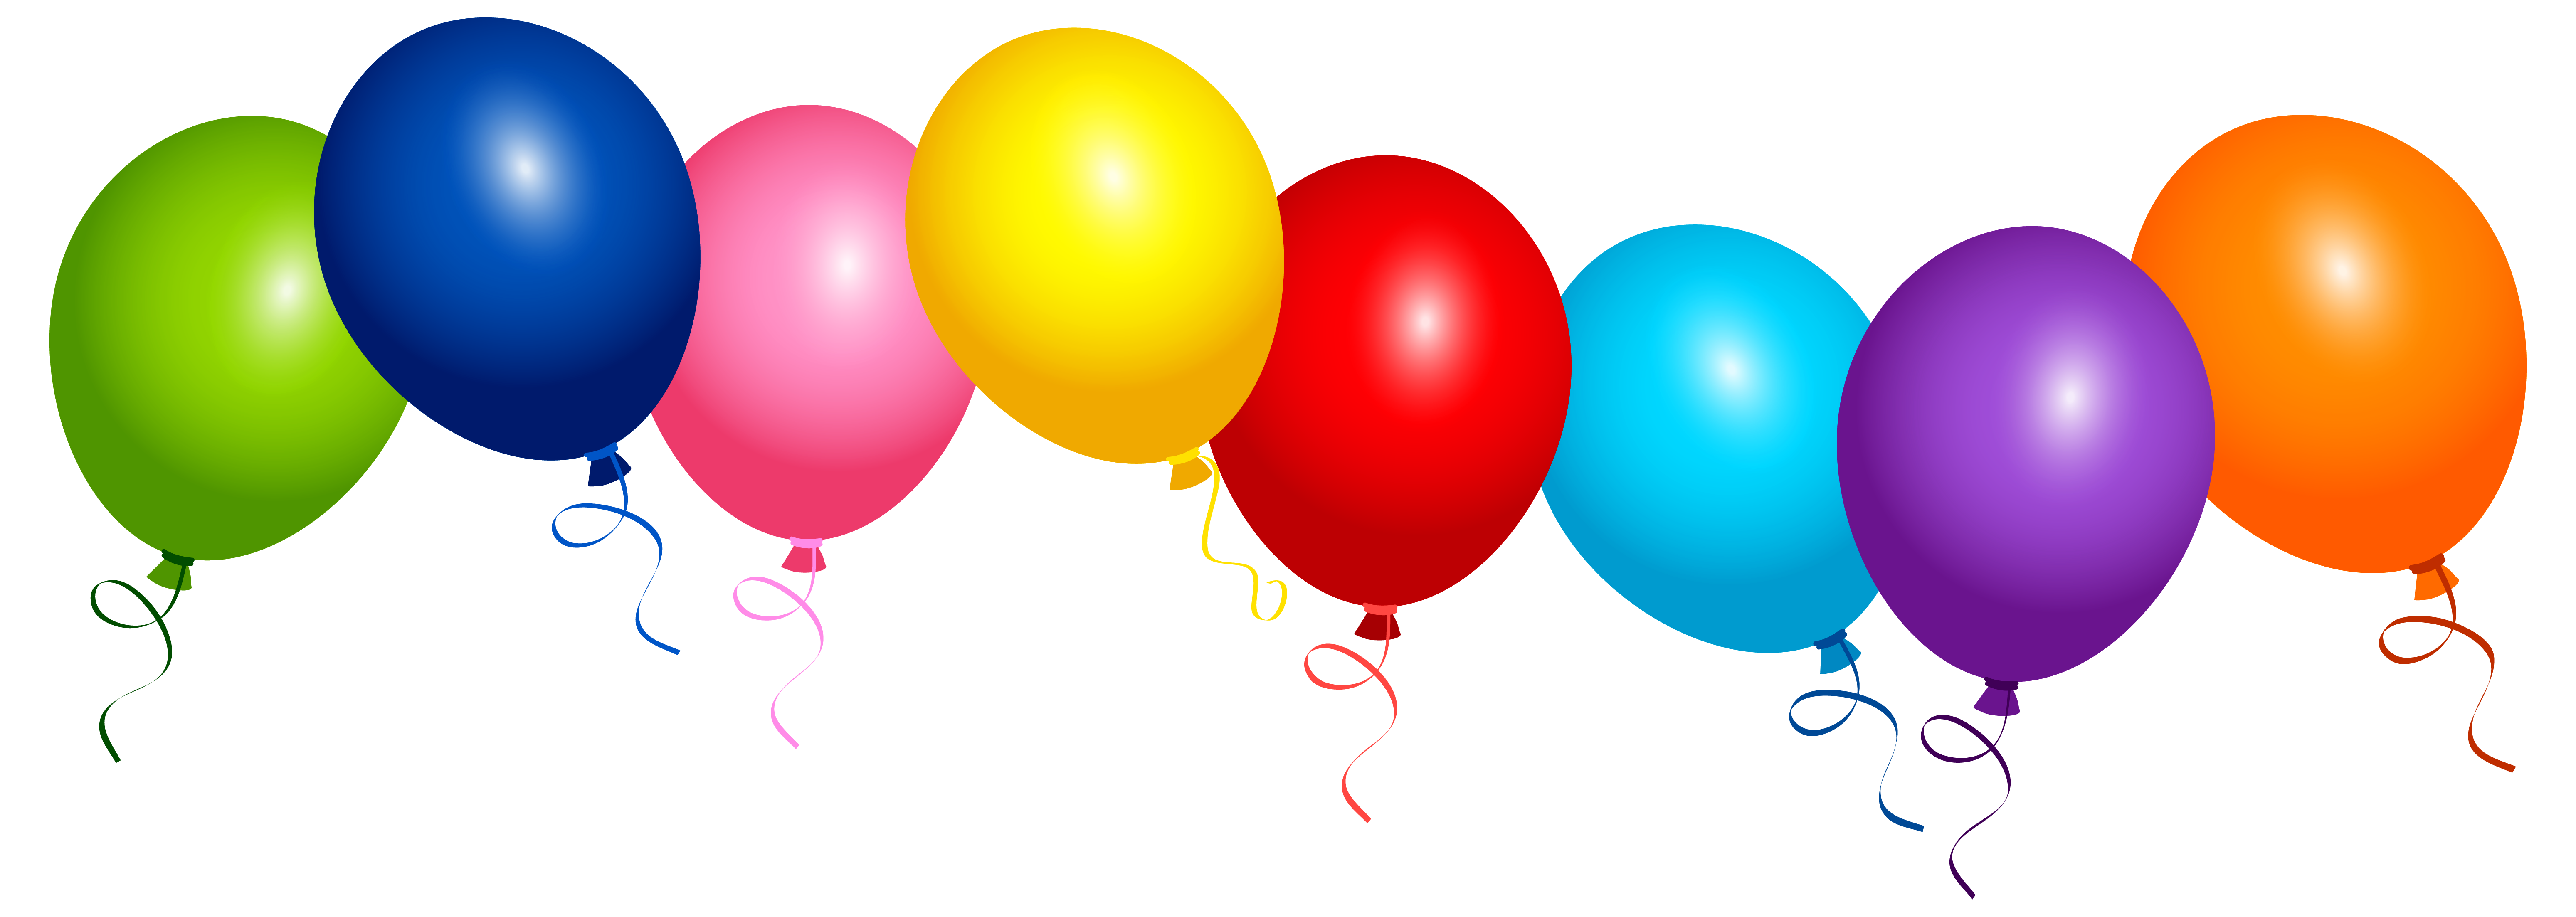 Clipart png balloon. Free jokingart com printable